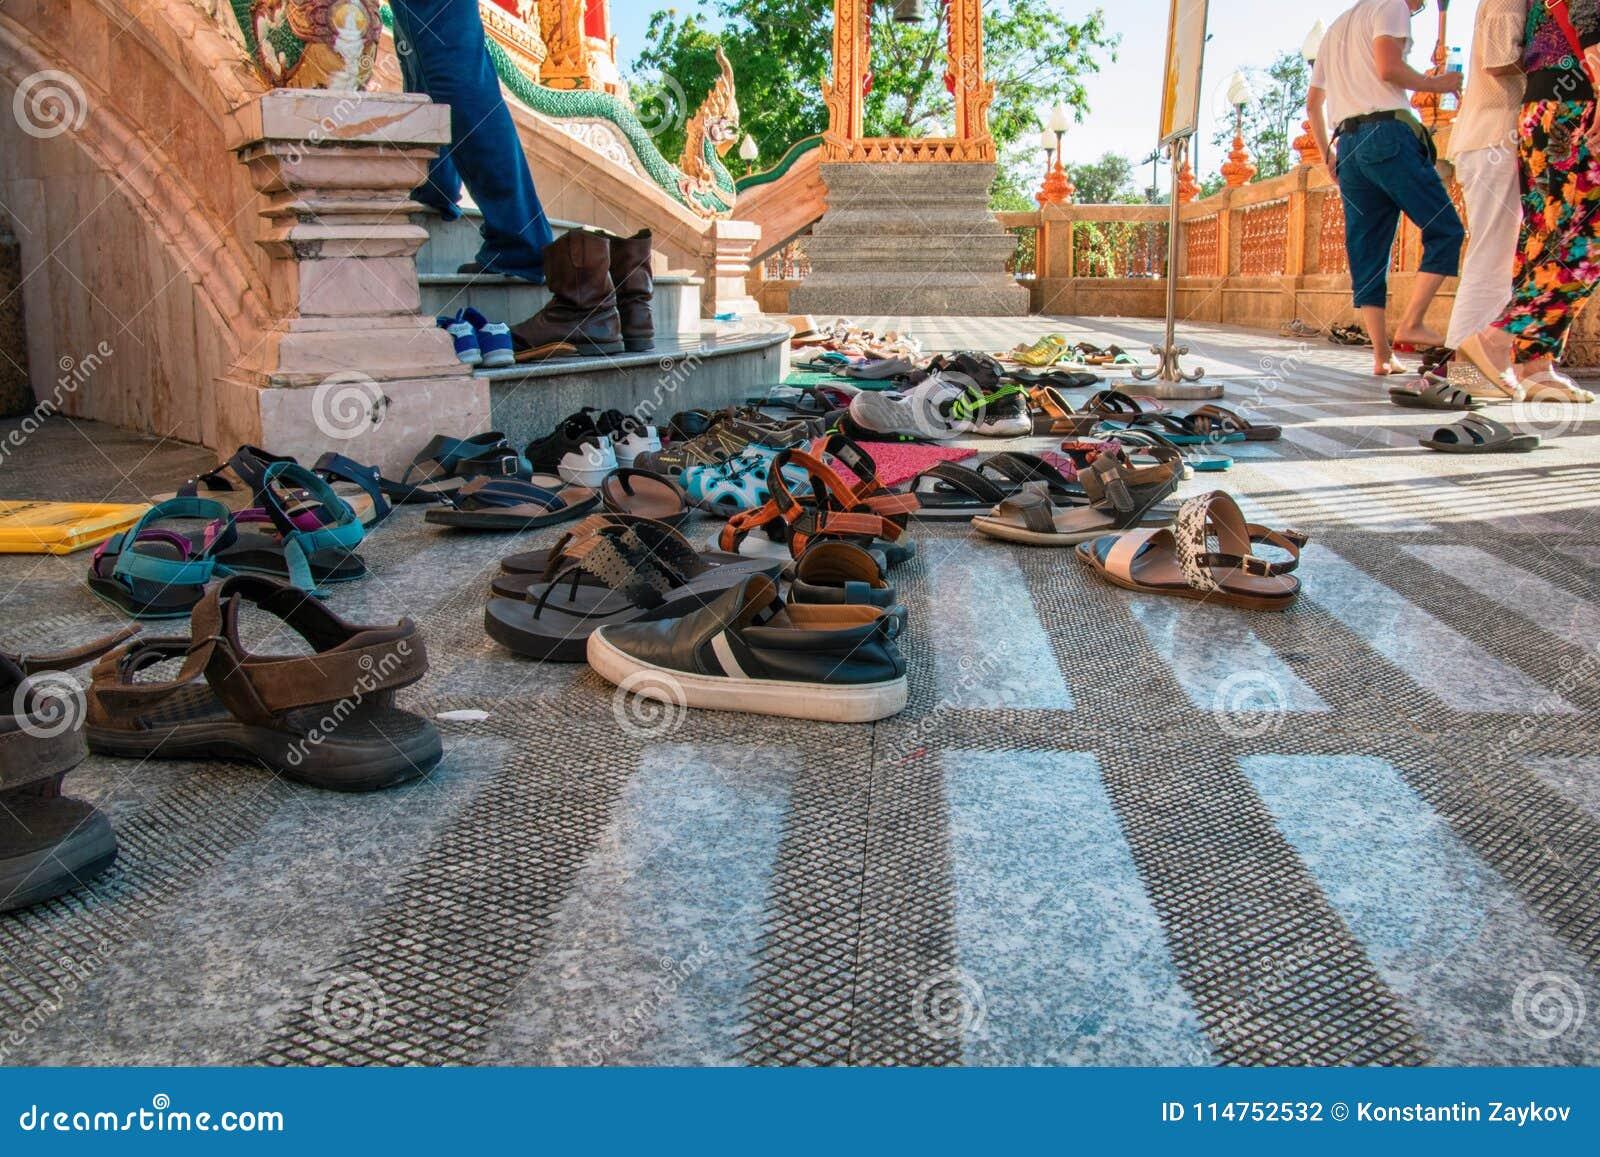 As sapatas sairam na entrada ao templo budista Conceito de observar tradições, tolerância, gratitude e respeito